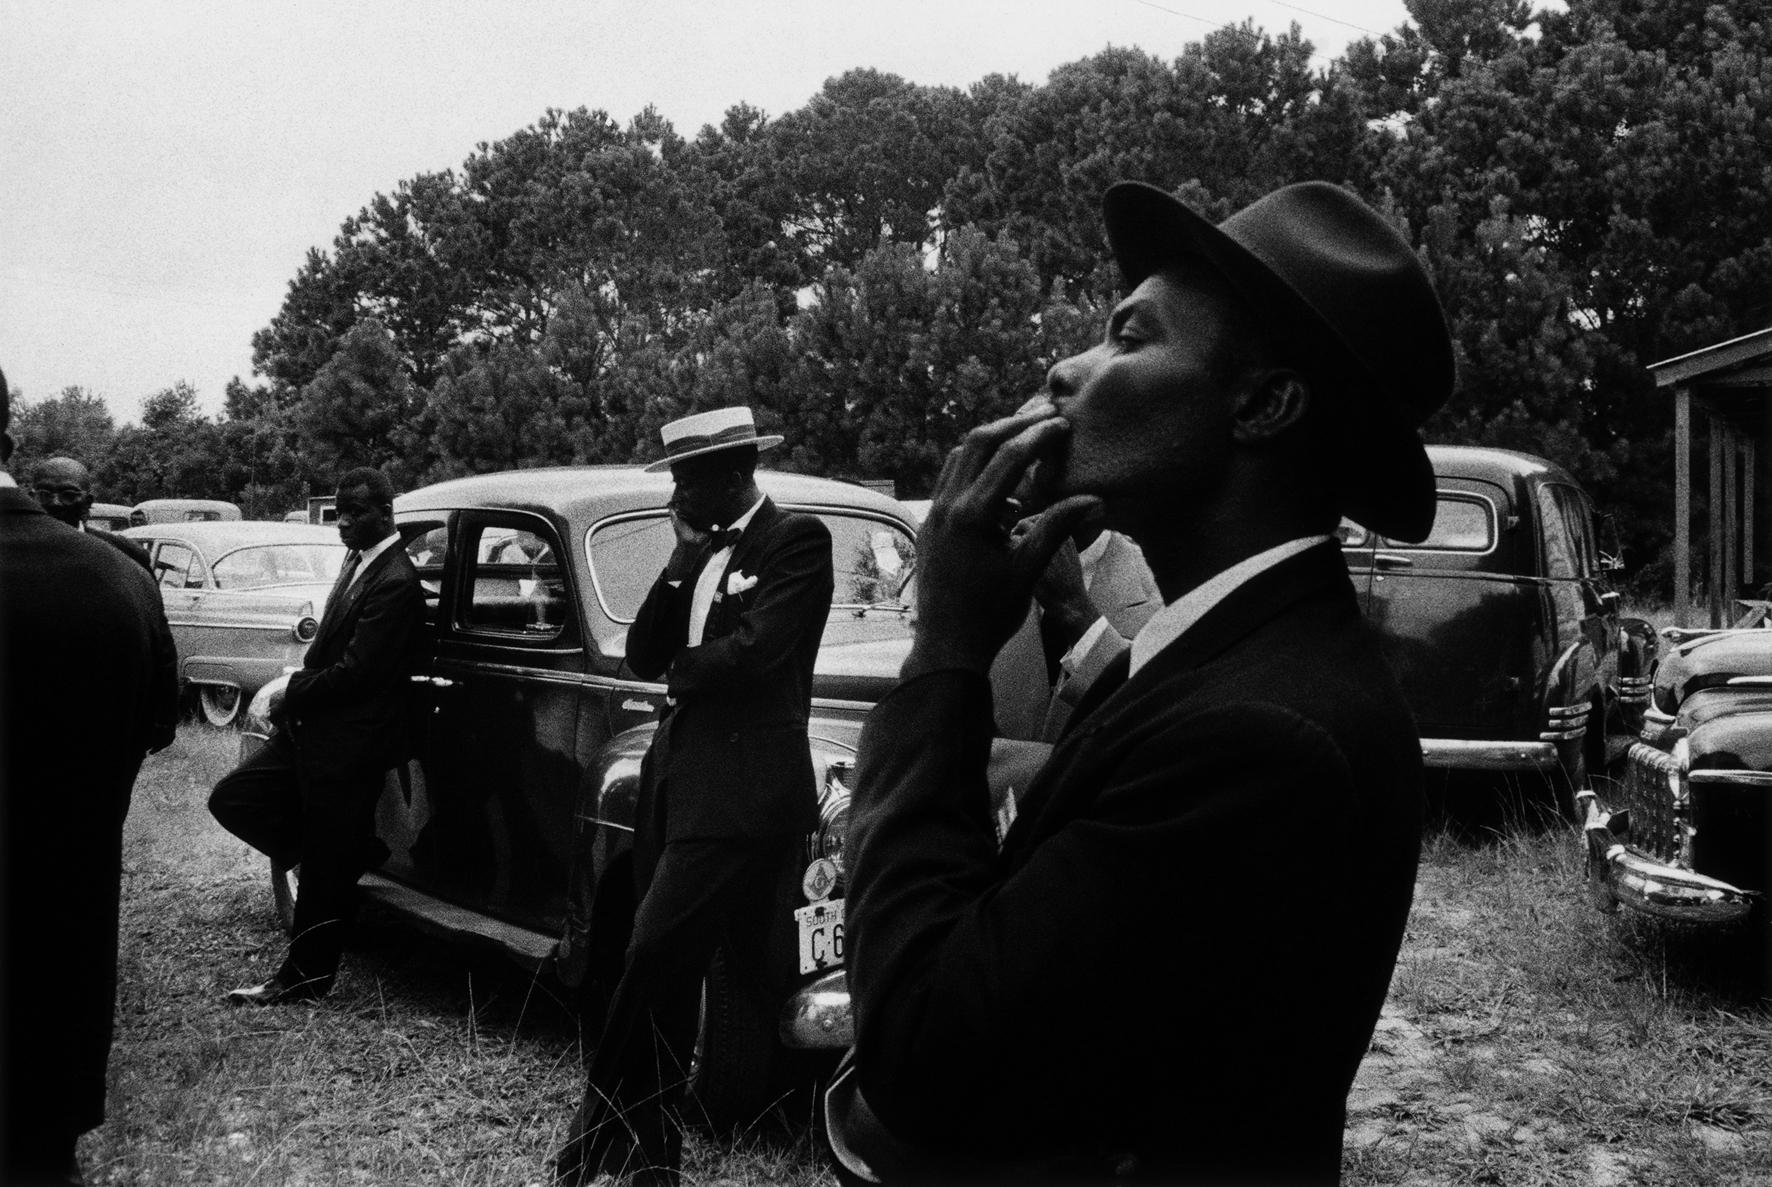 Robert Frank - Funerale, St. Helena South Carolina 1955